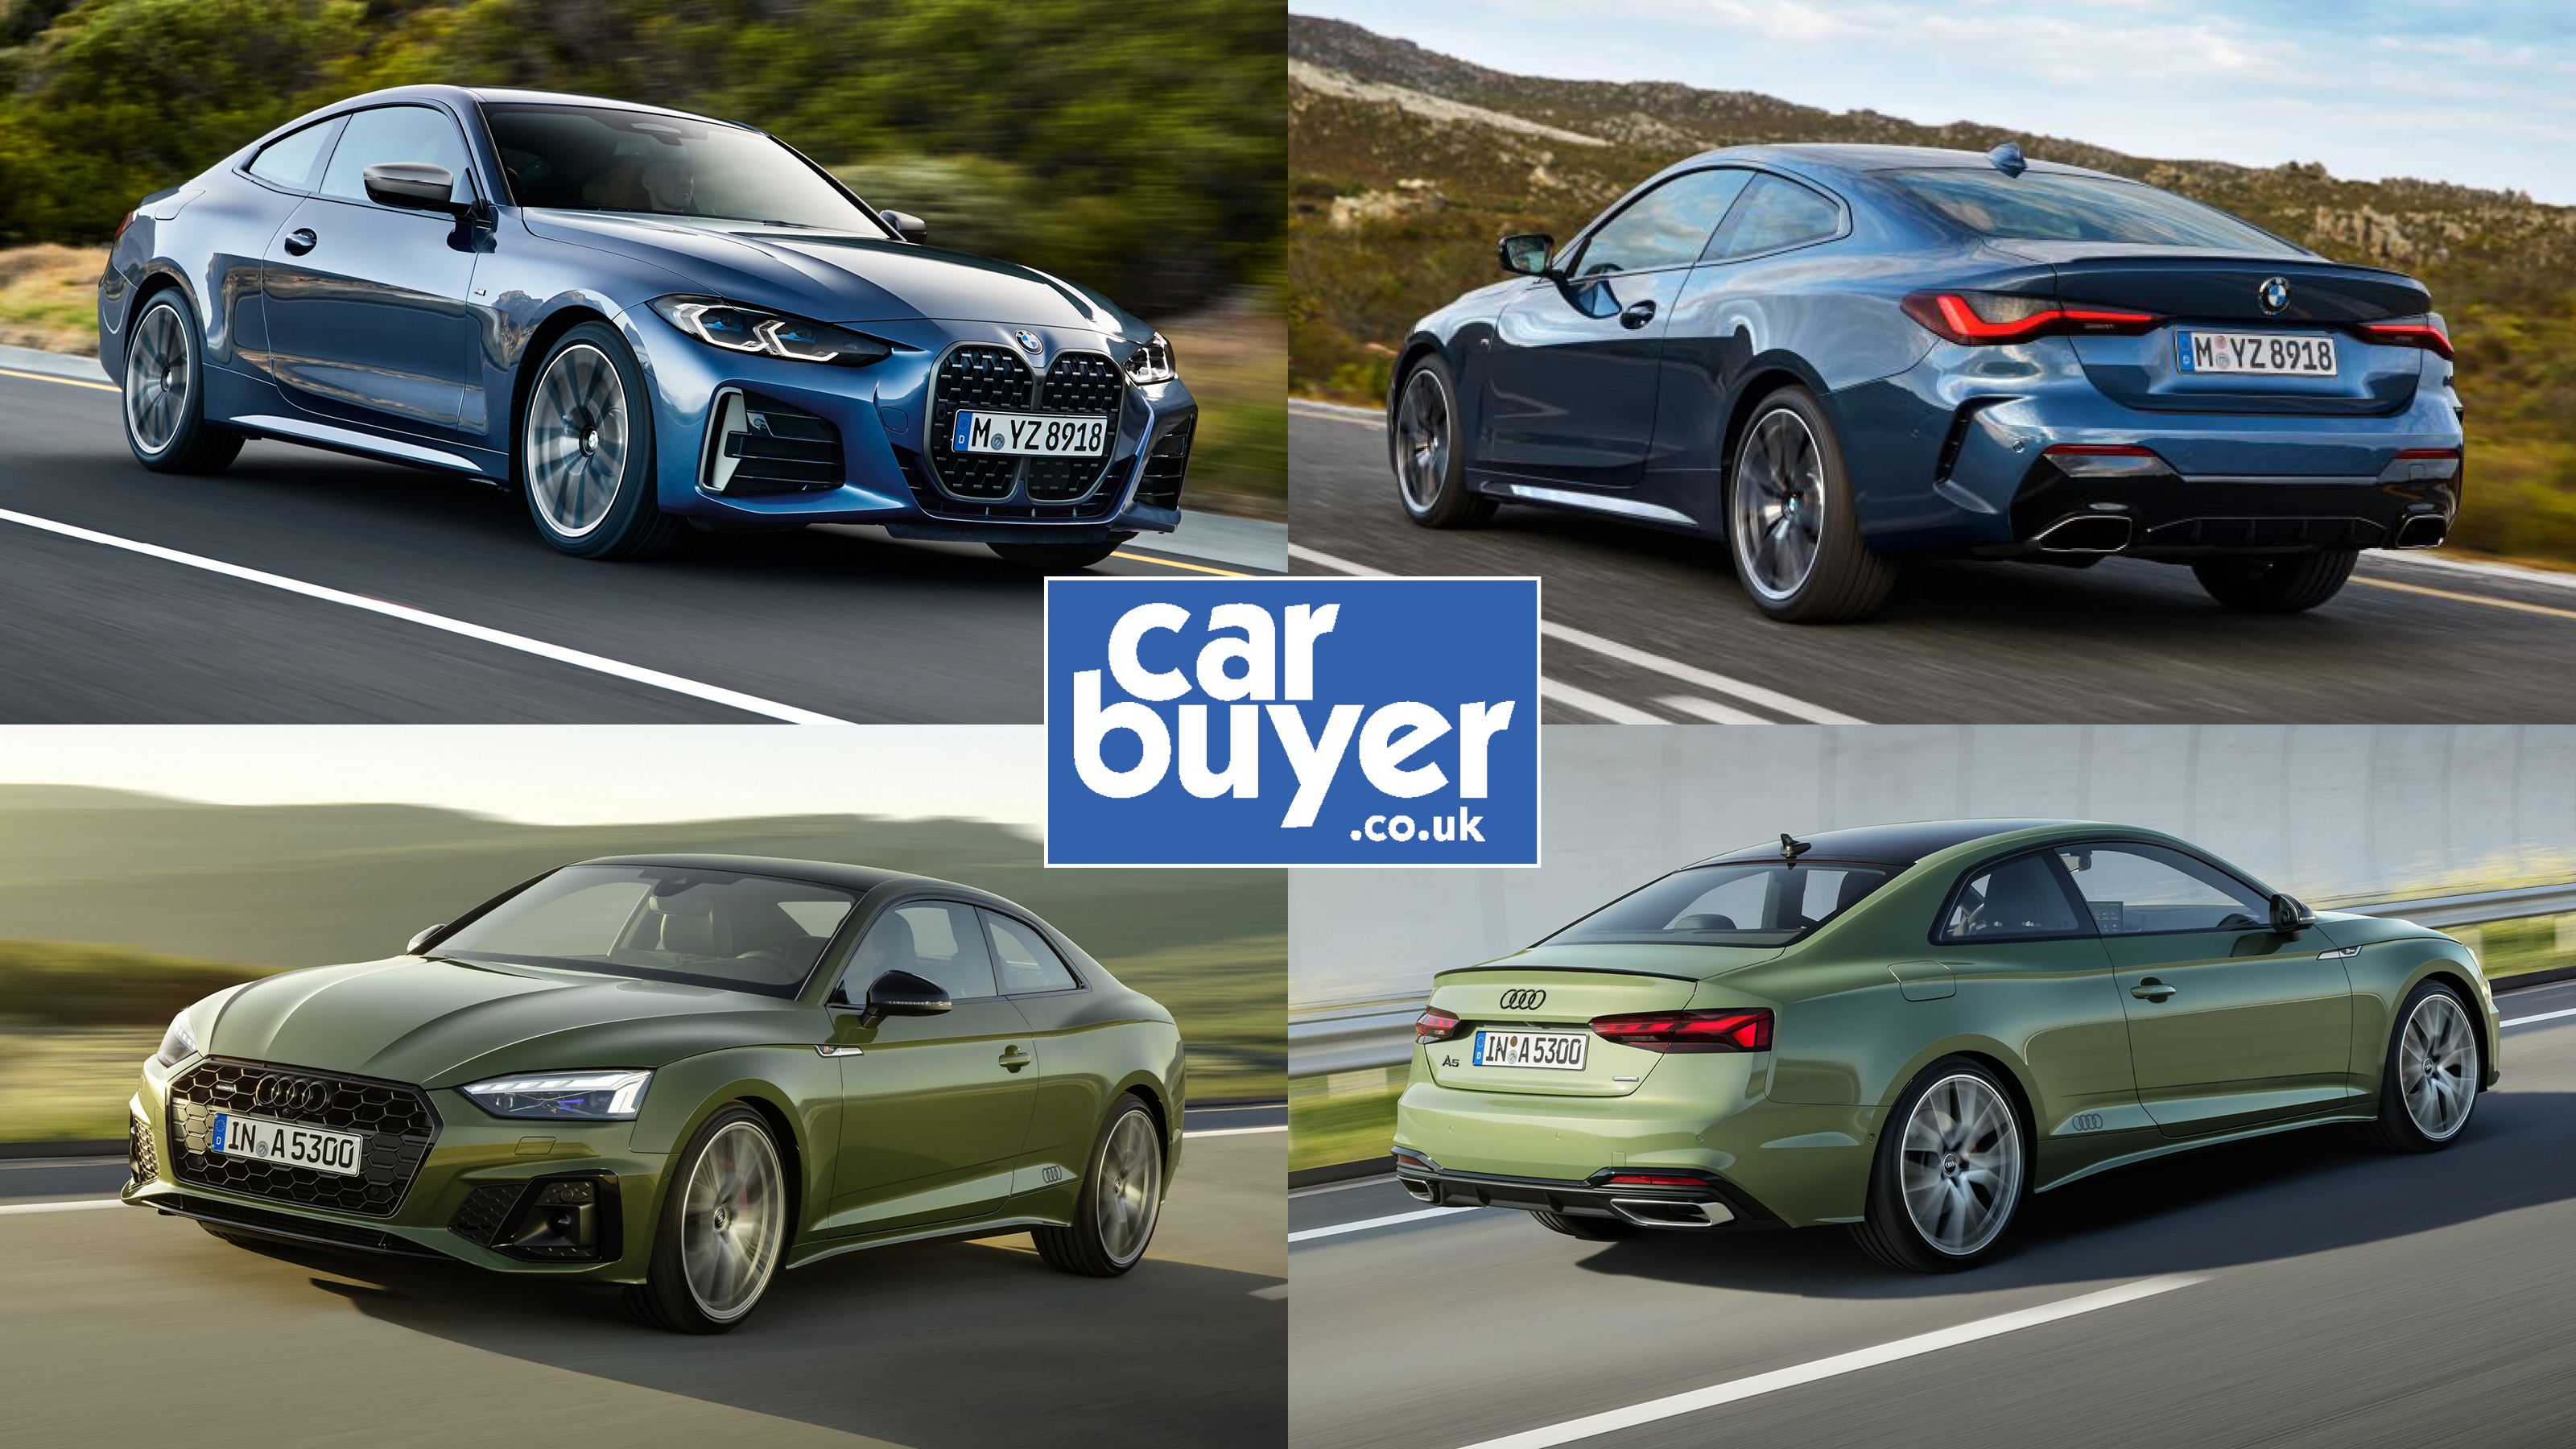 Kekurangan Audi Bmw Perbandingan Harga